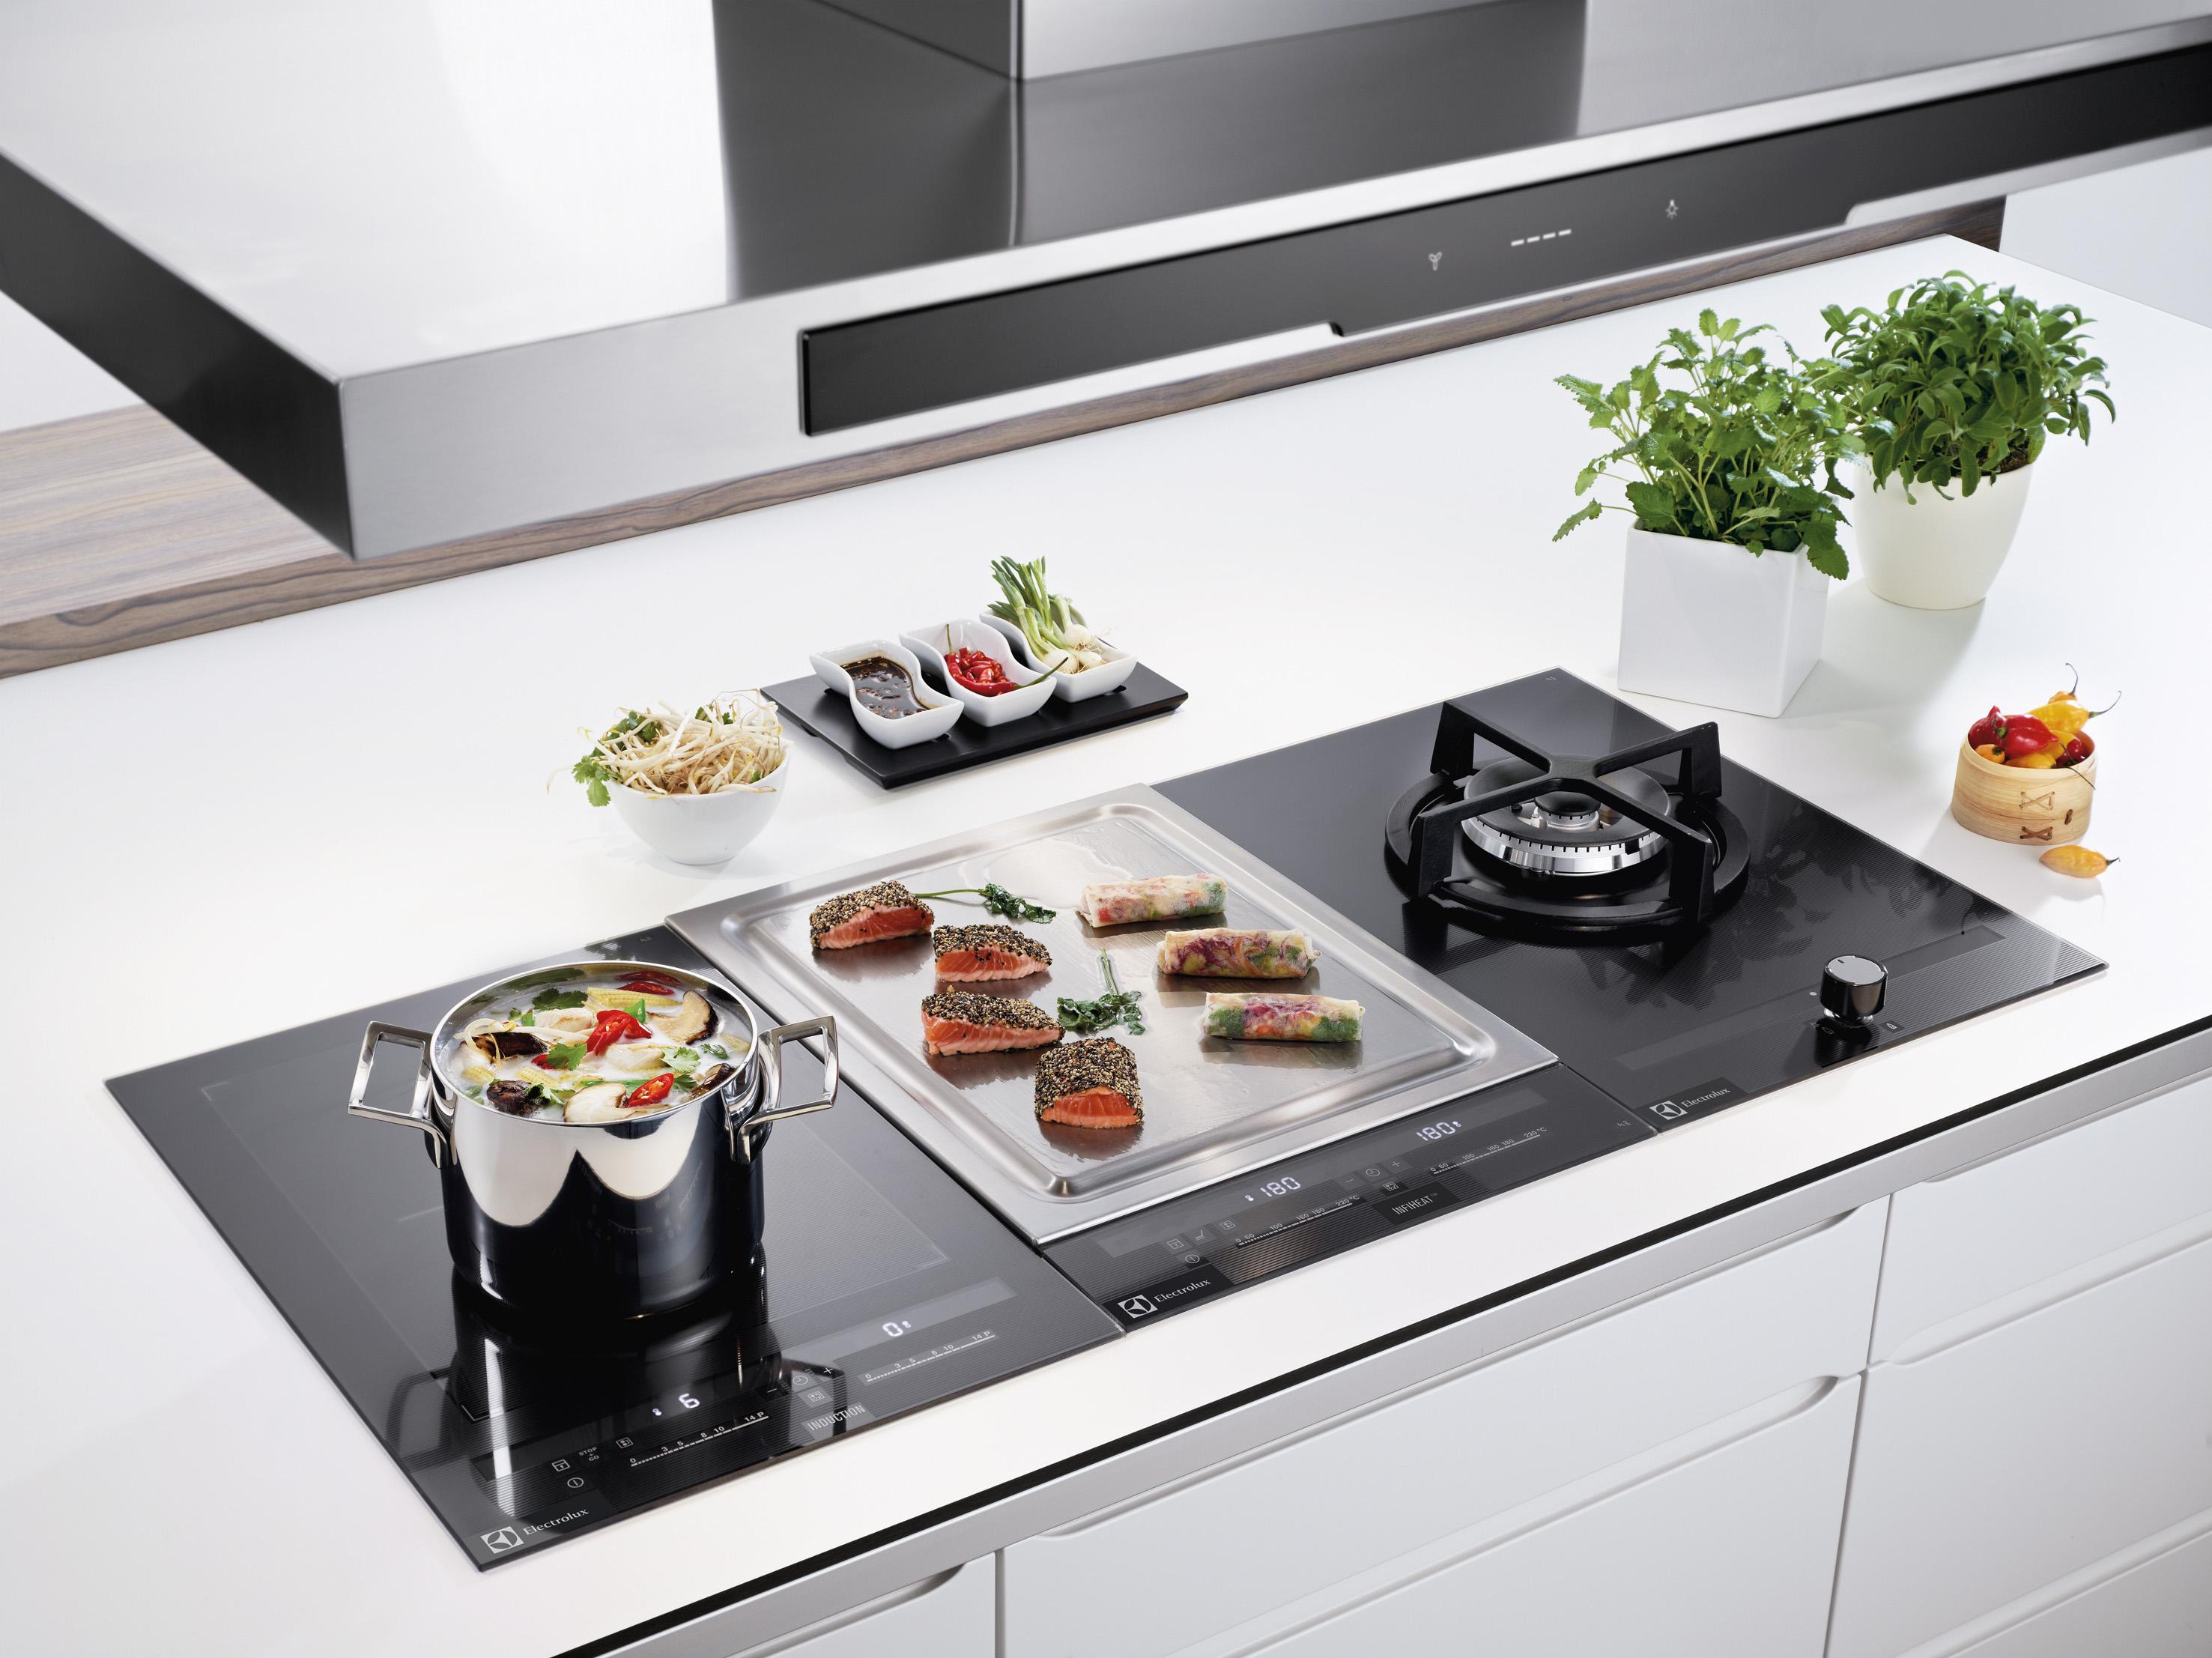 electrolux eqt4520bog teppanyaki grillmodul asiatisch kochen mit stil. Black Bedroom Furniture Sets. Home Design Ideas